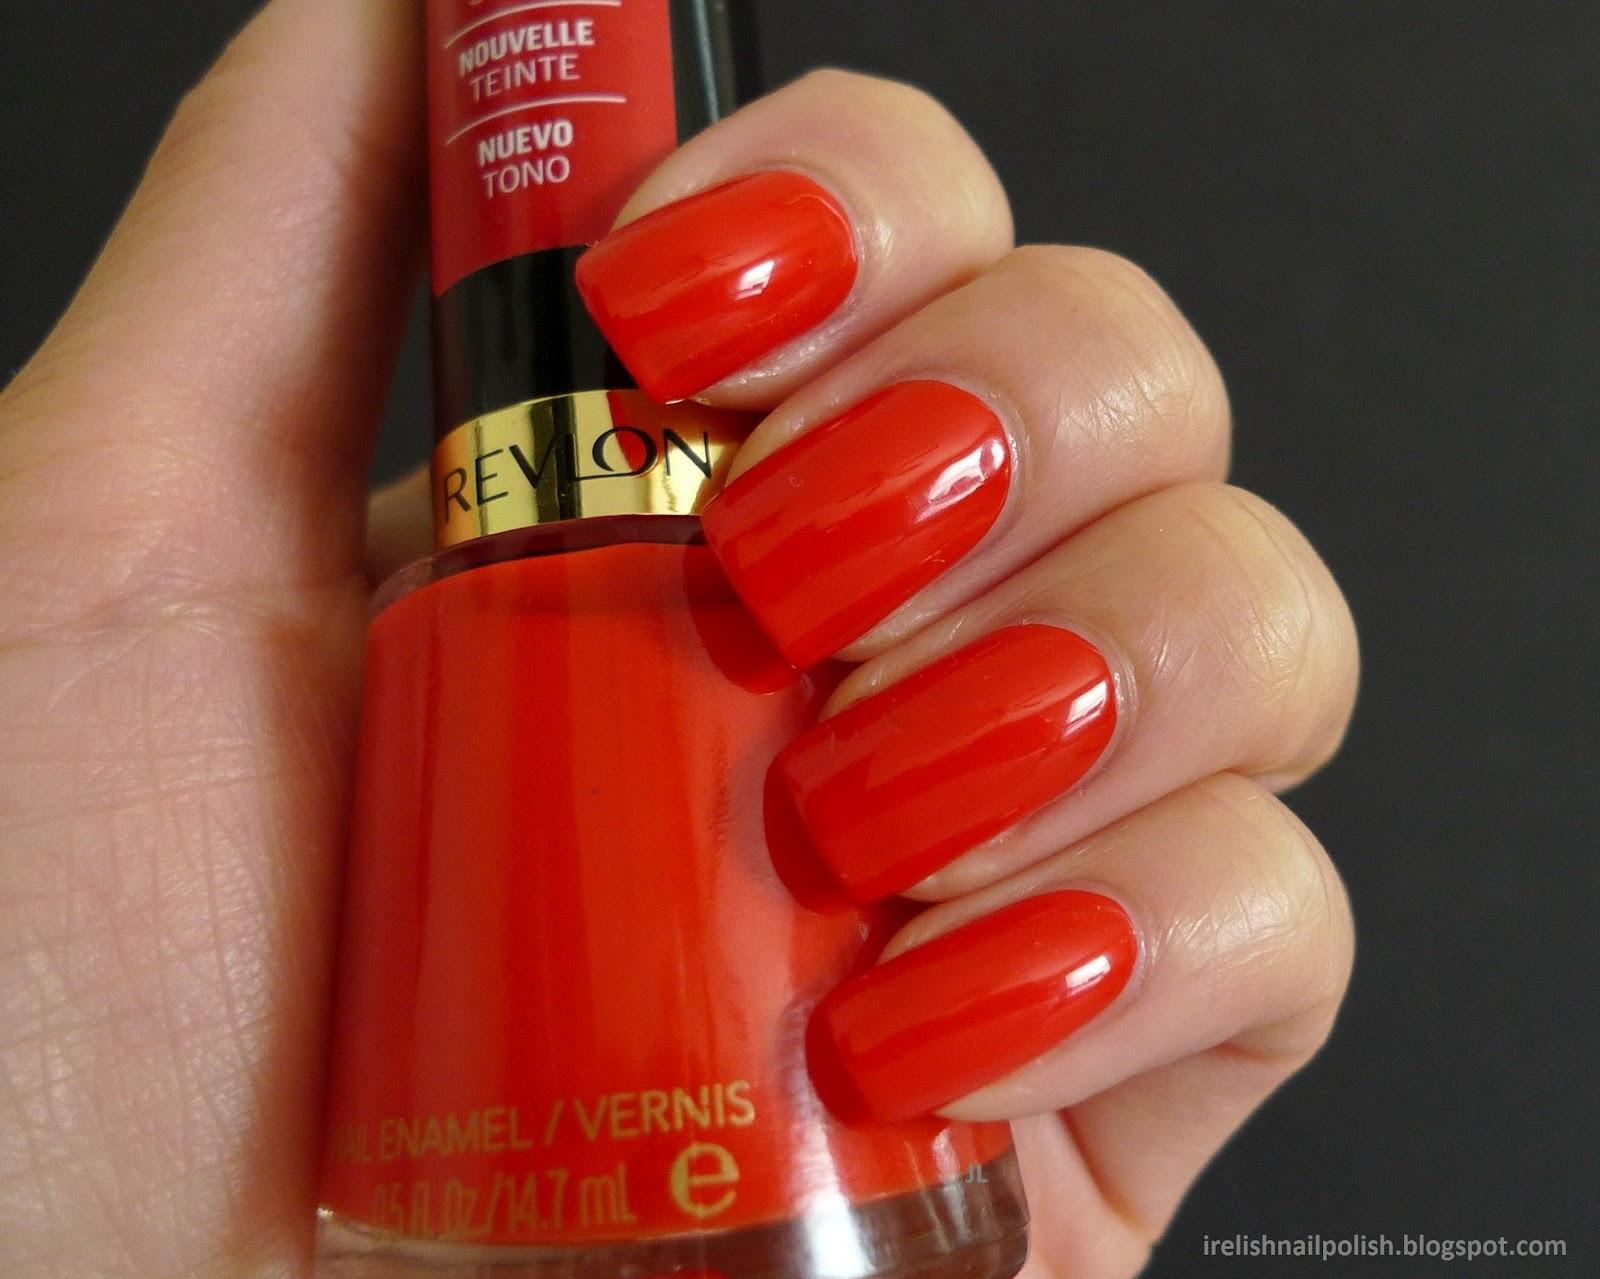 I Relish Nail Polish!: Revlon Red Bikini by Gucci Westman